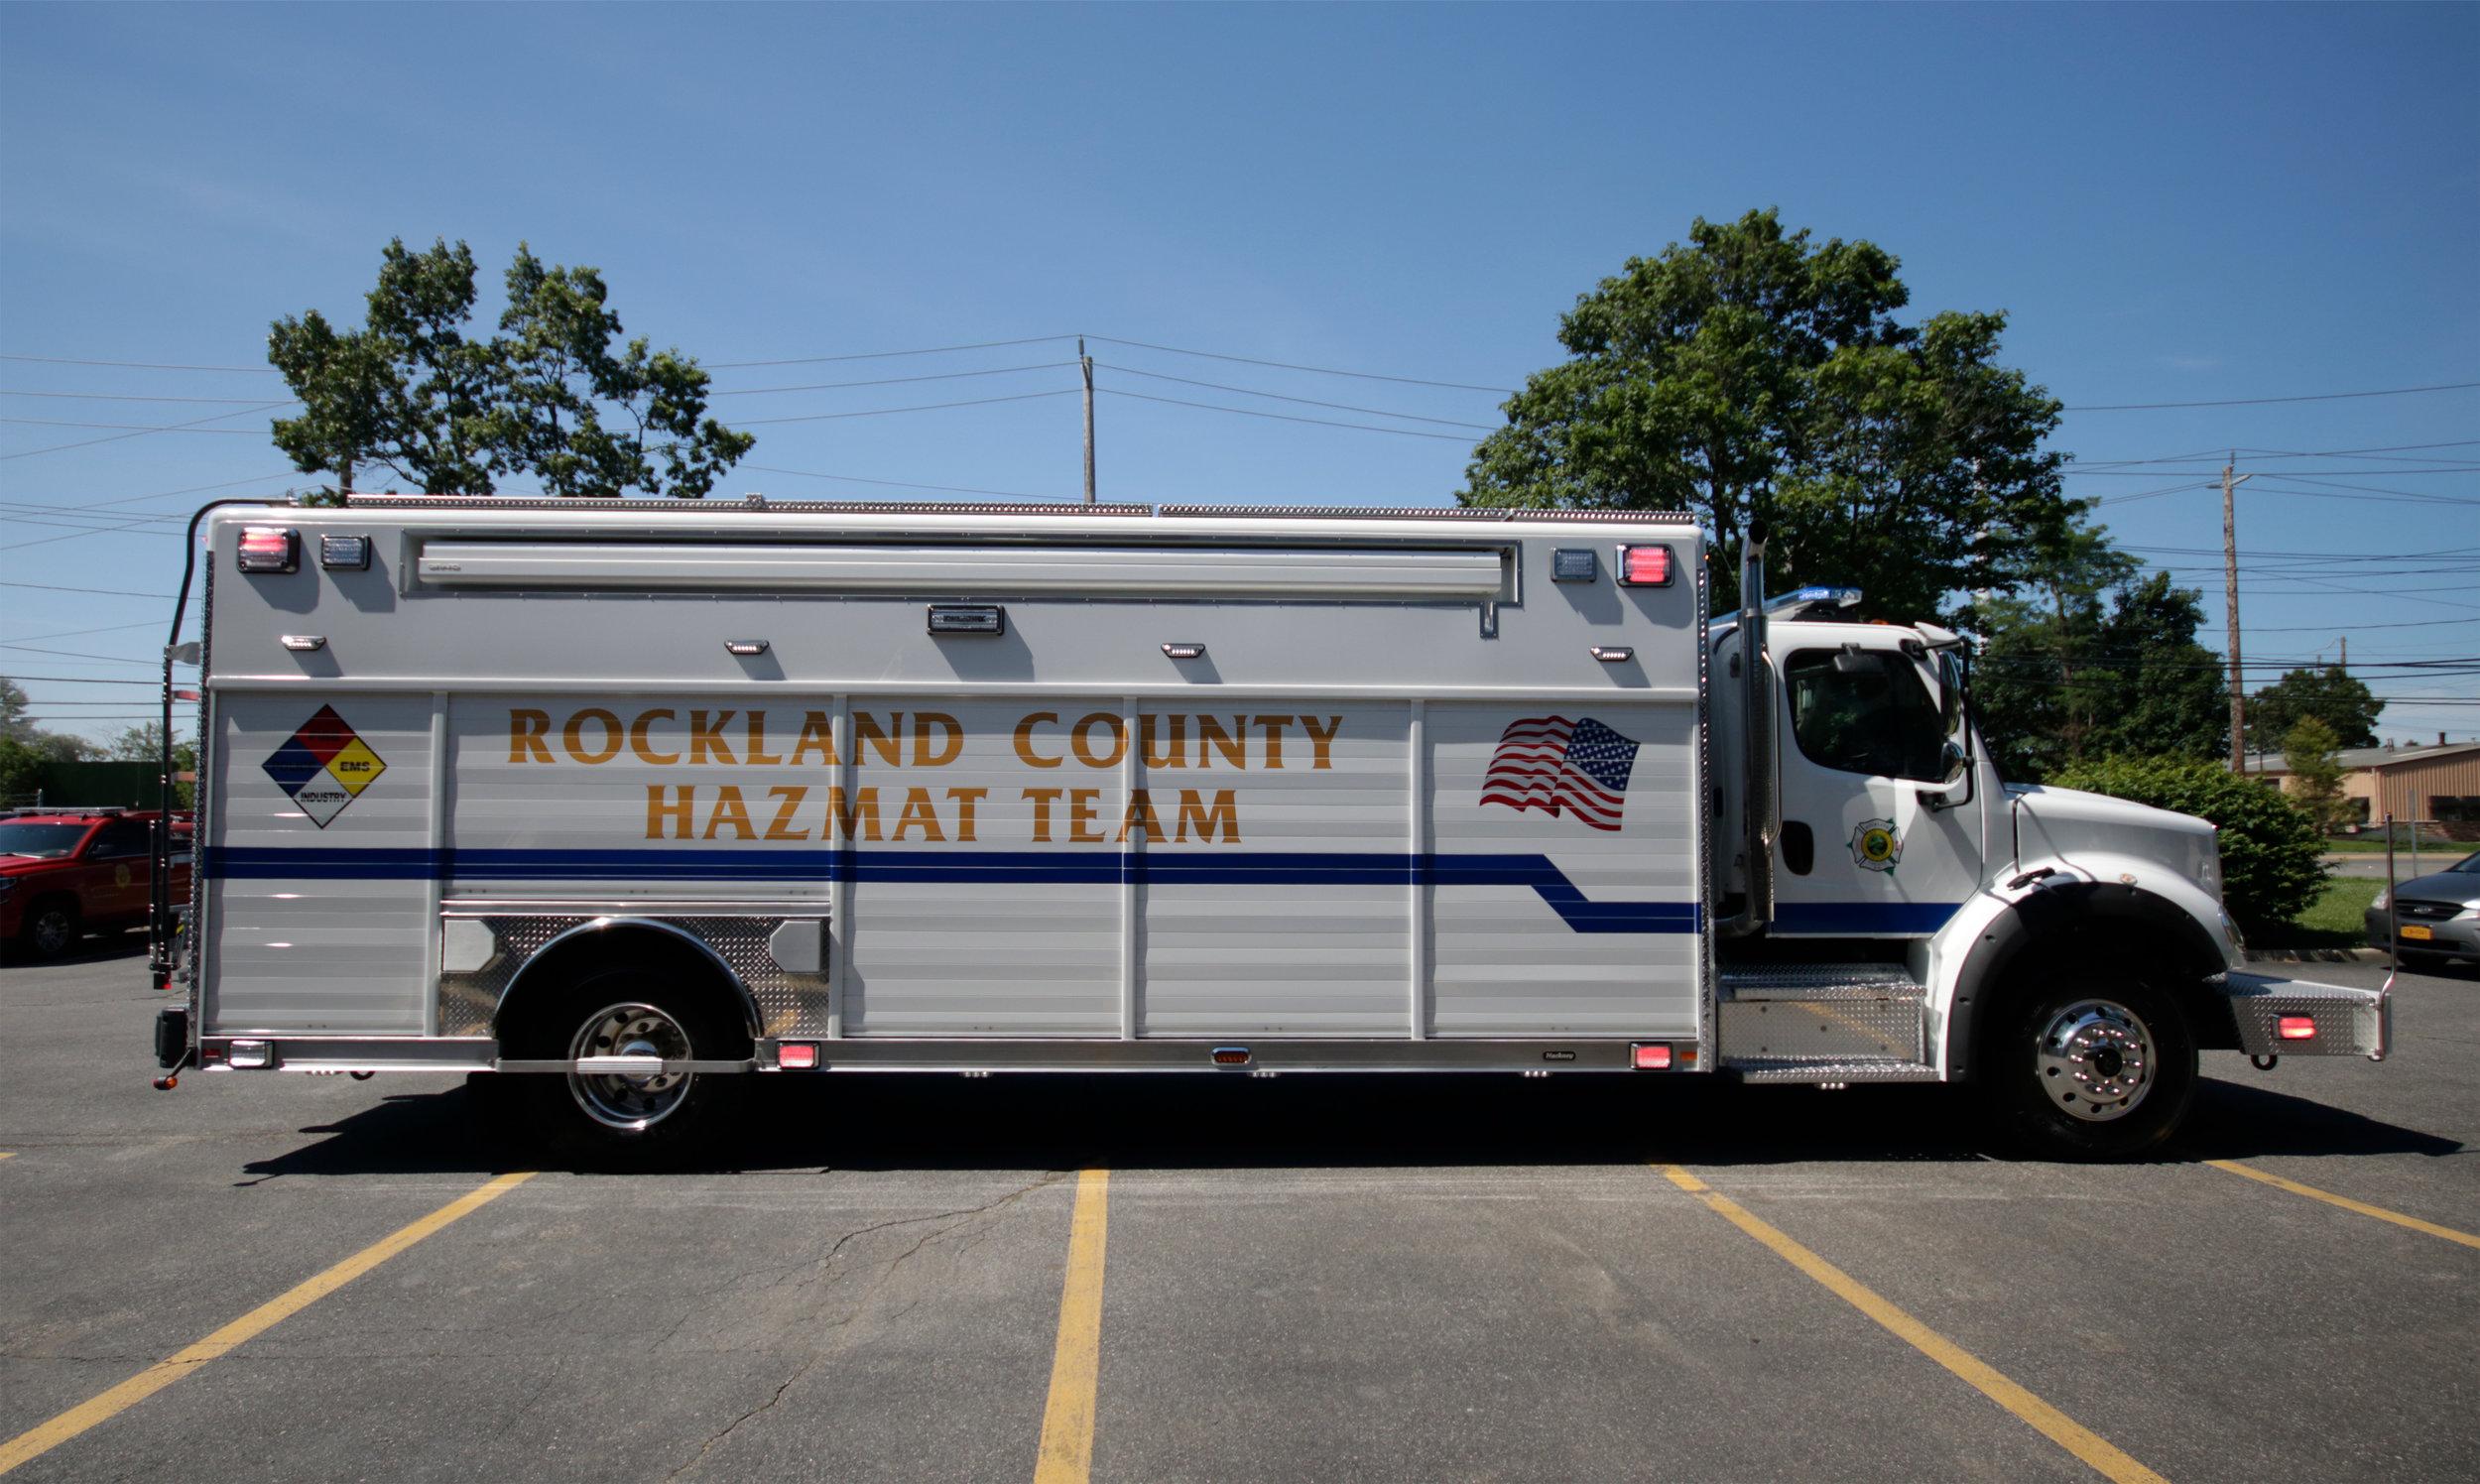 391-rocklandcounty.jpg